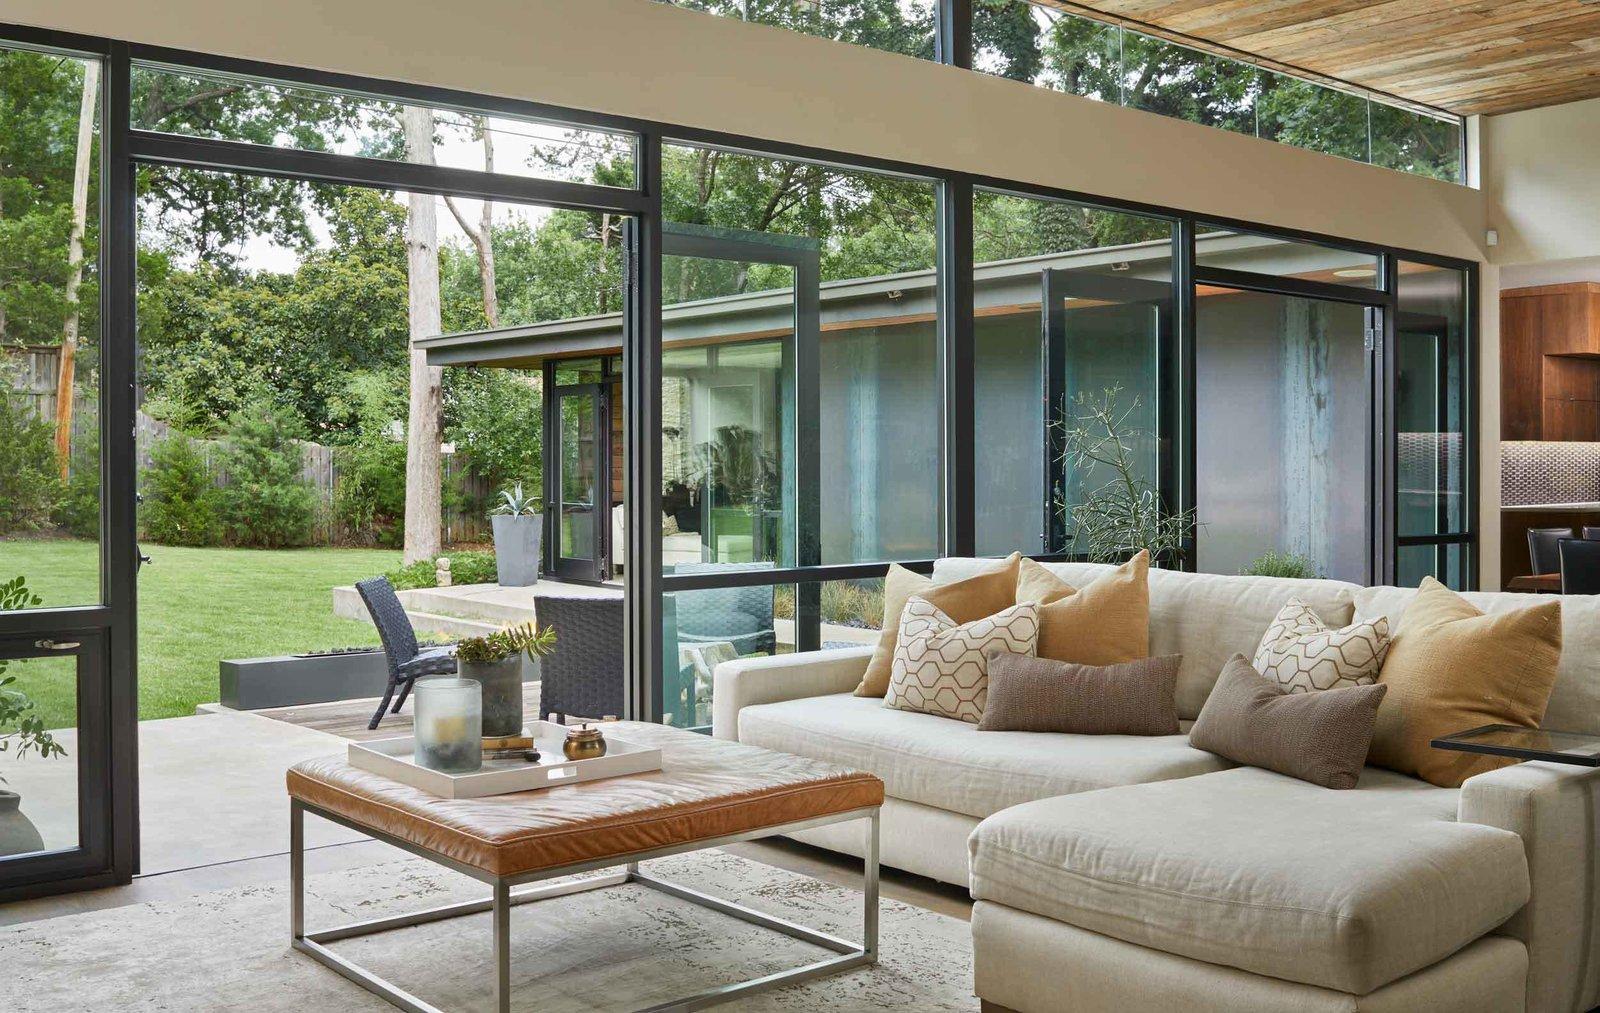 Living Room, Sofa, Sectional, Coffee Tables, End Tables, and Medium Hardwood Floor  Kessler Residence